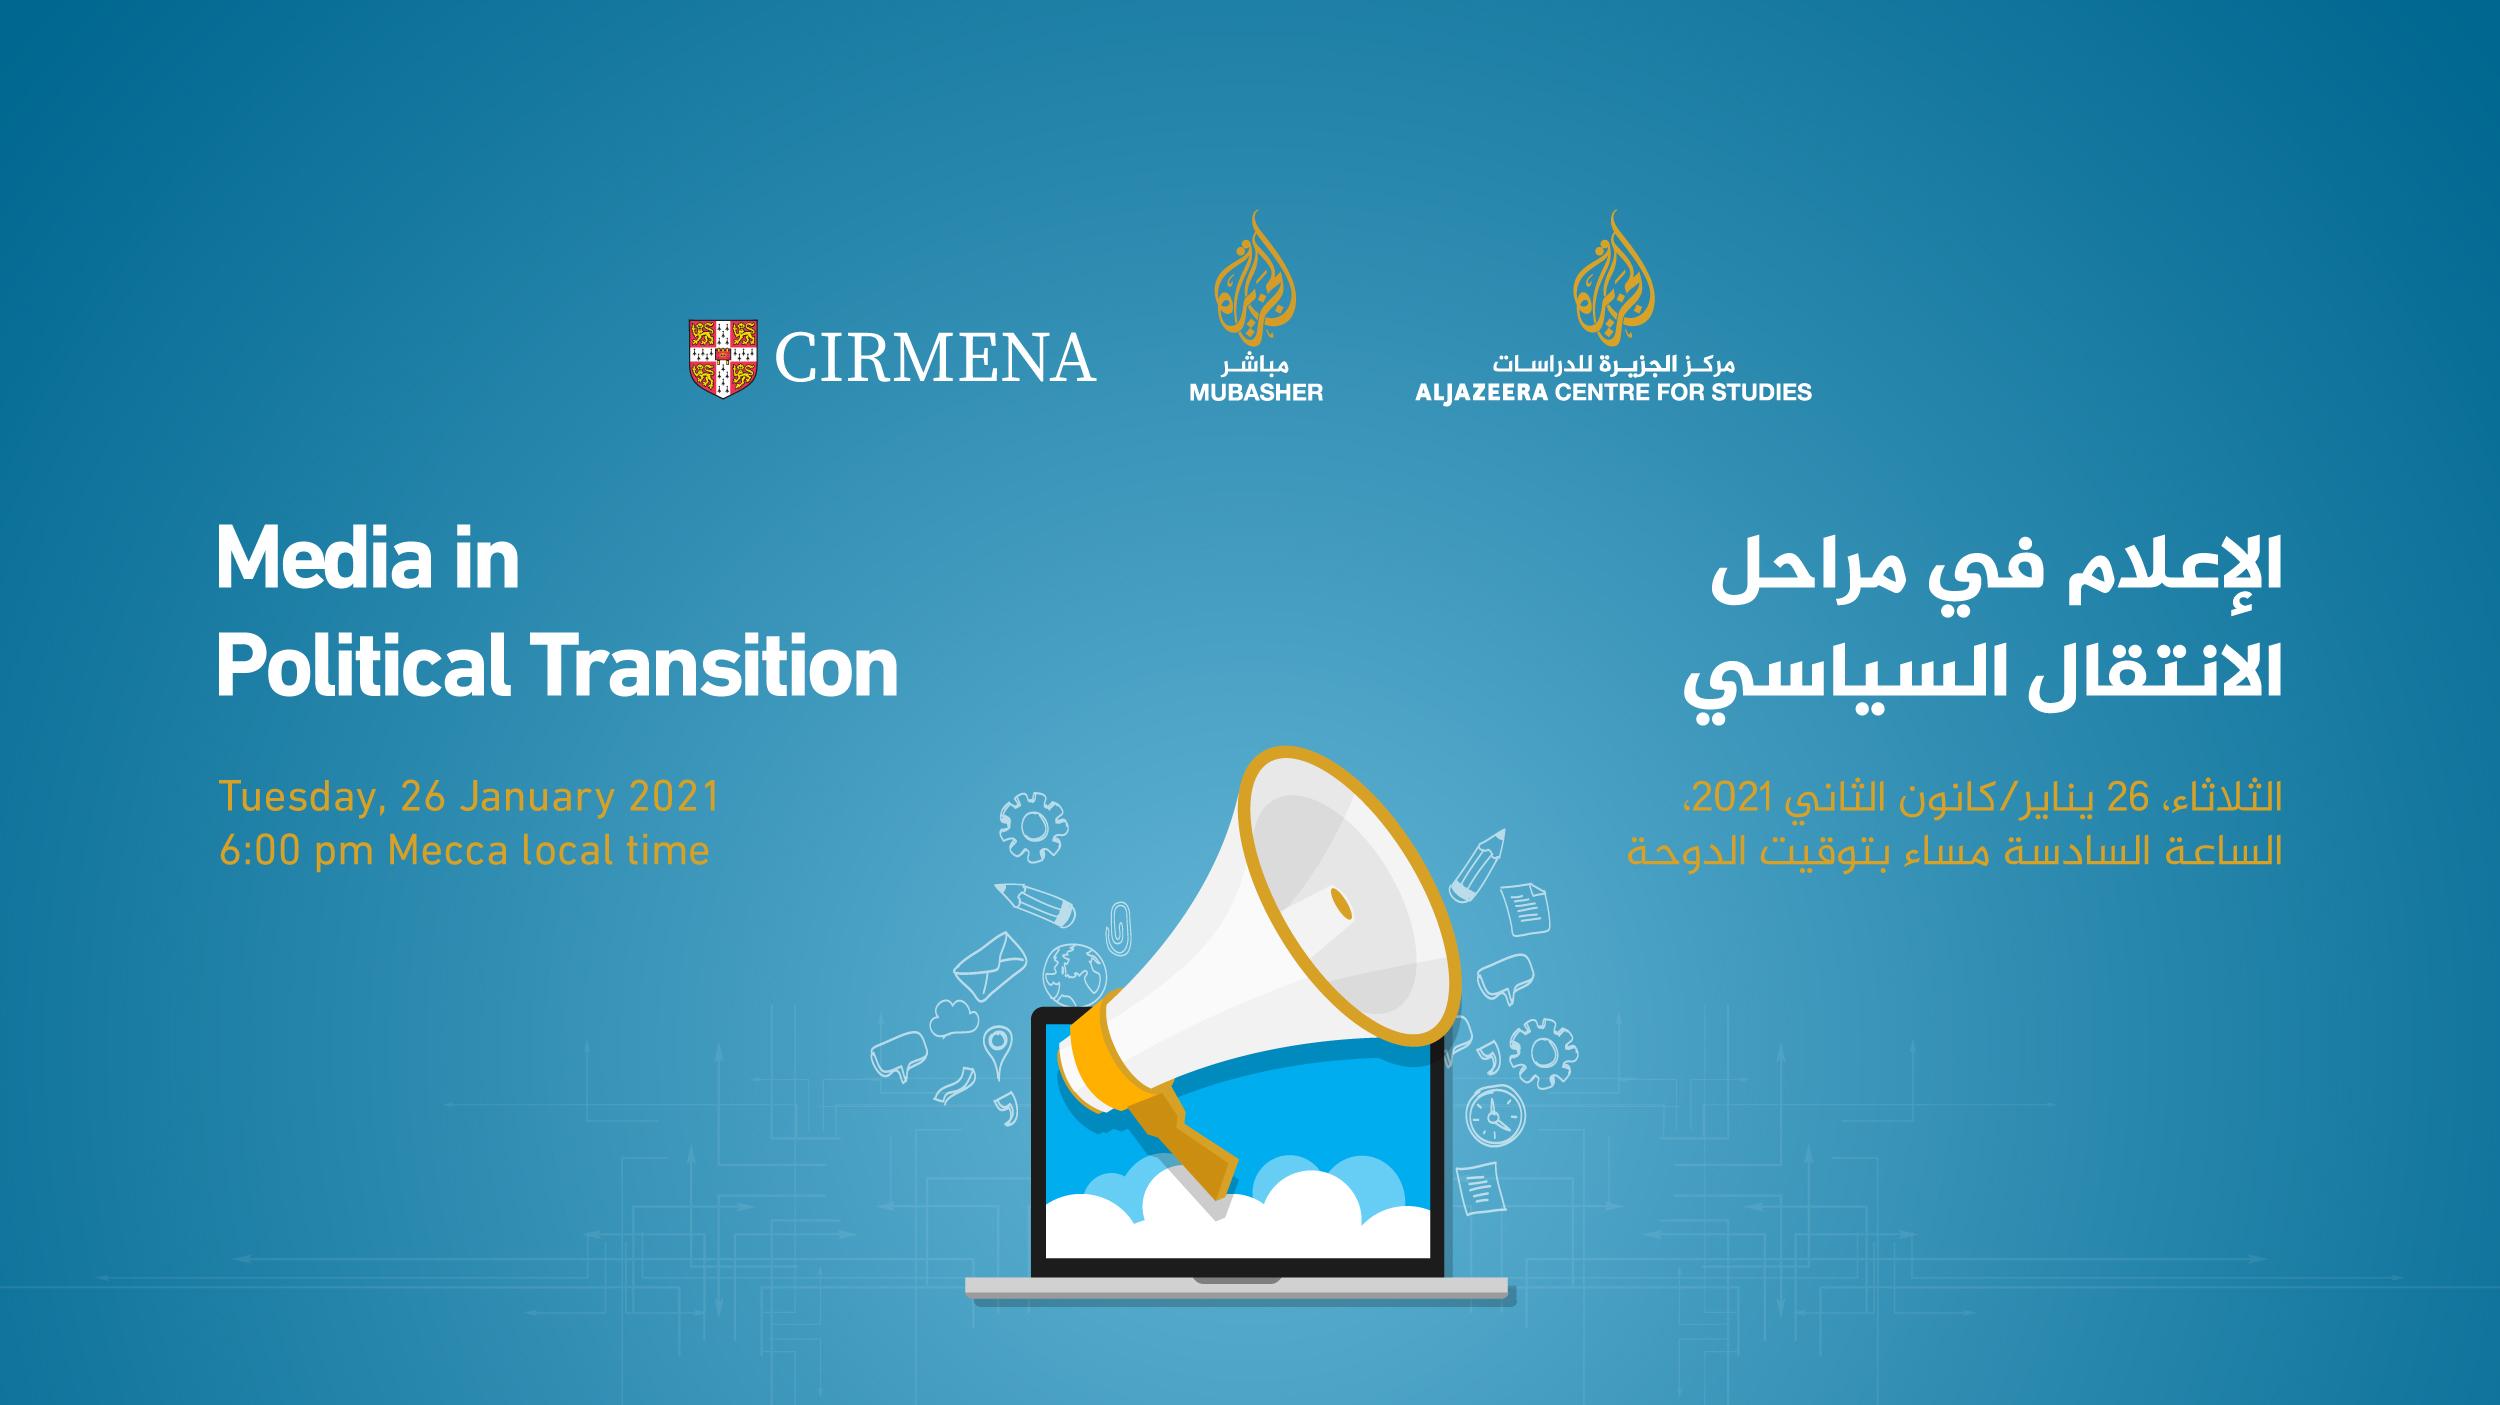 studies.aljazeera.net: Media in Political Transition in the Southern Mediterranean after 2011